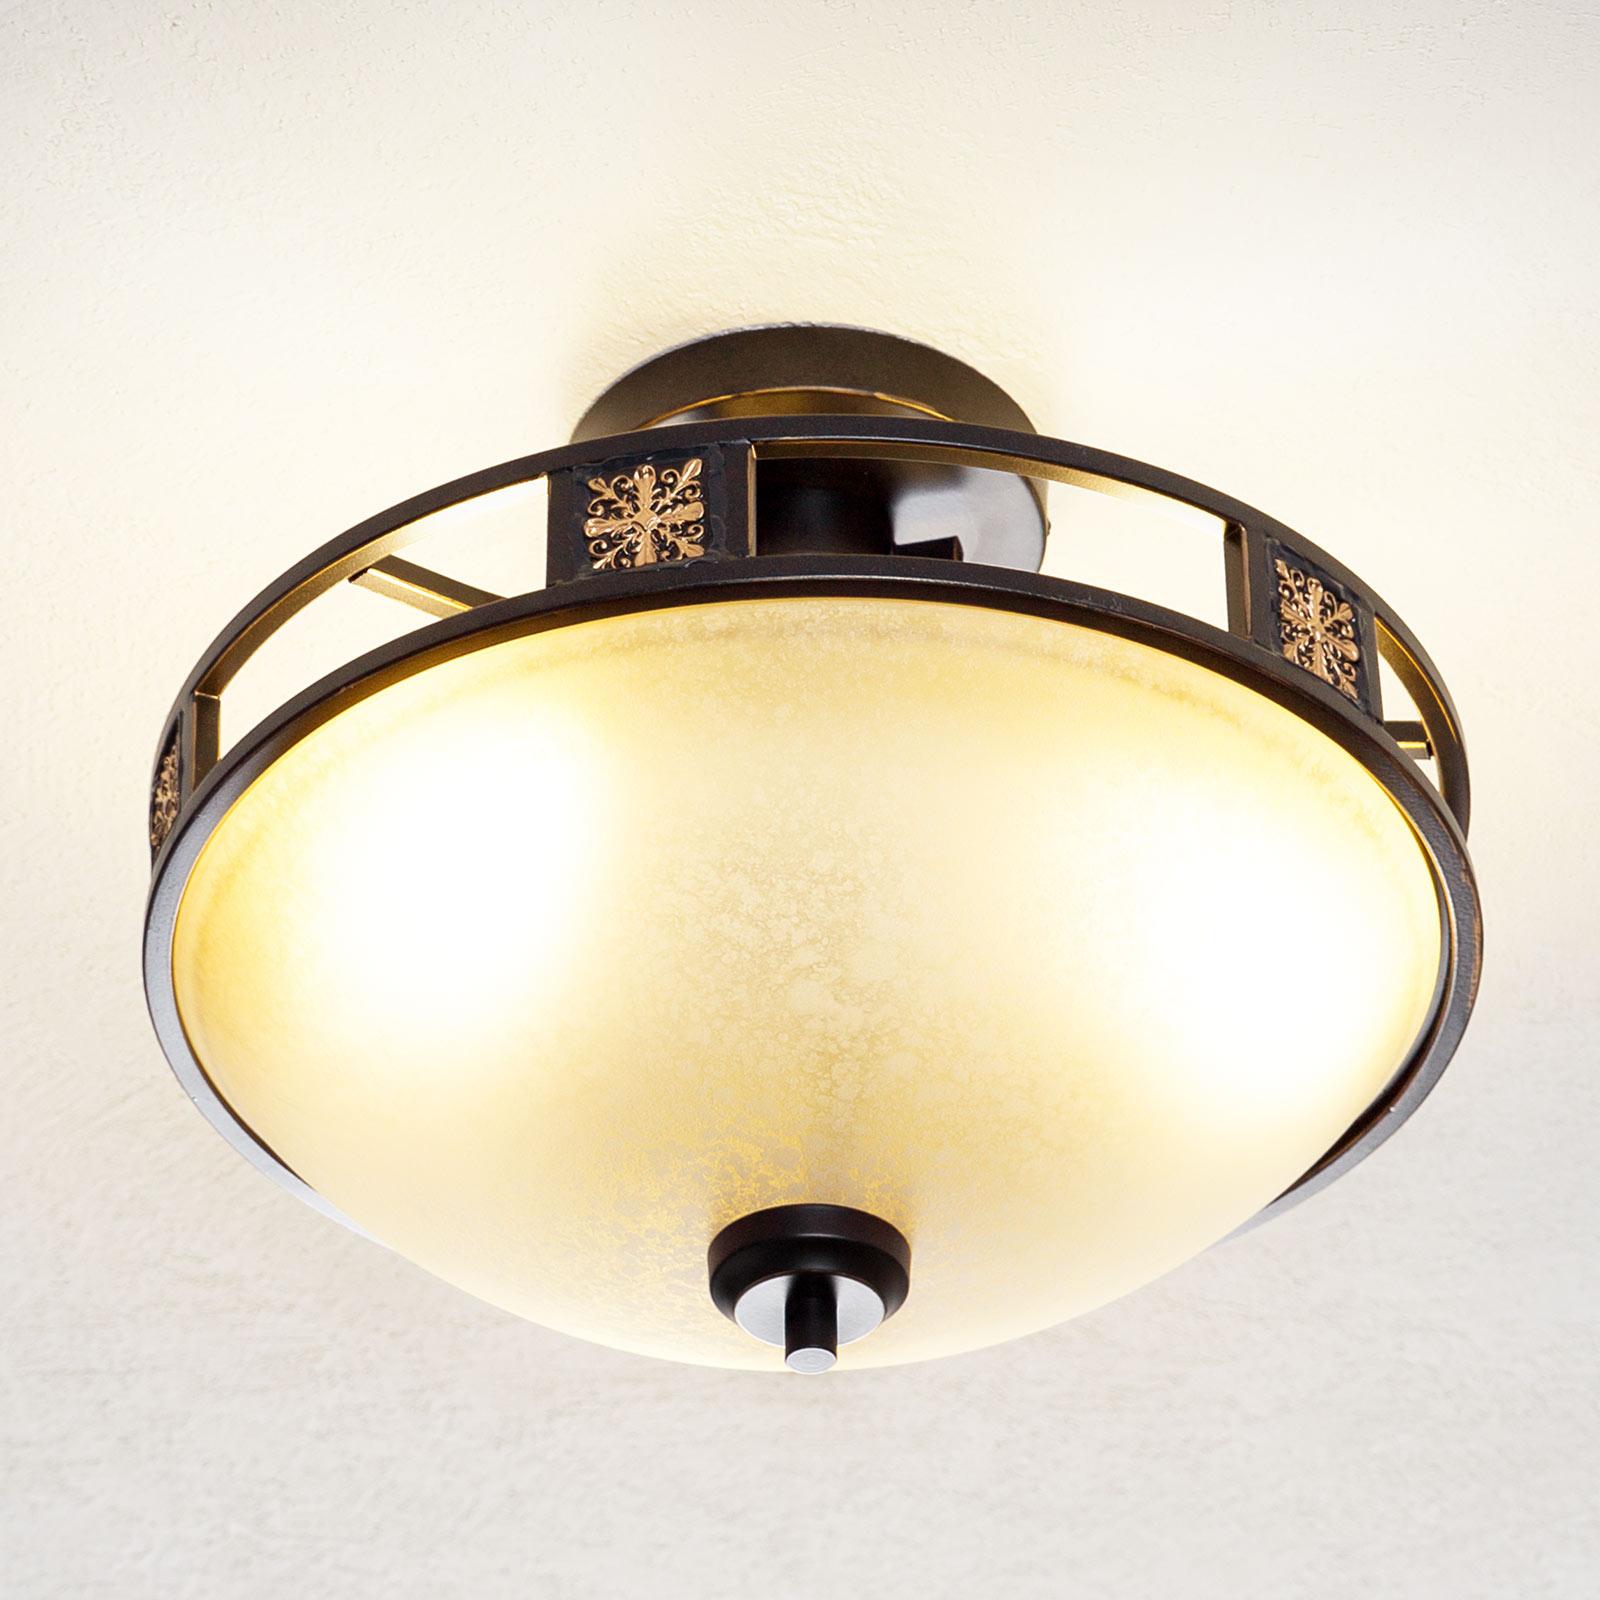 Caecilia den antik designede loftslampe, 42 cm